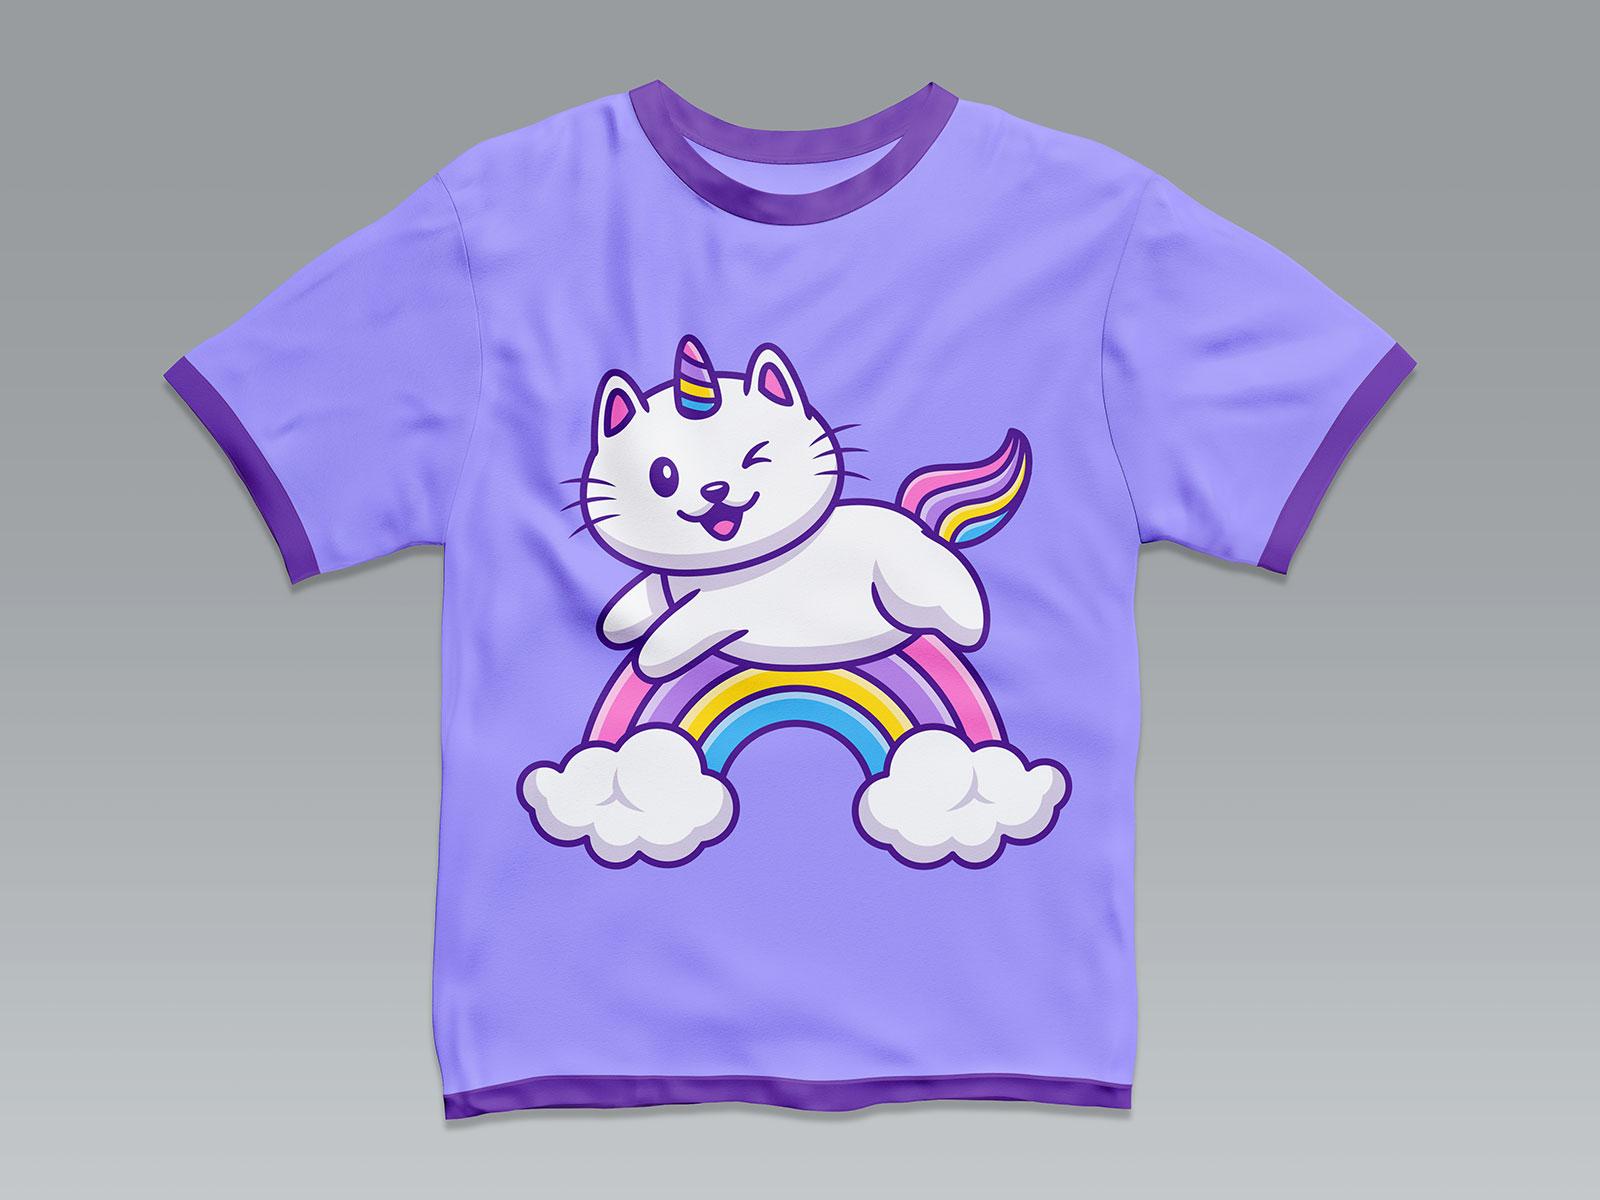 Free Kids Short Sleeves Tee Mockup PSD Set